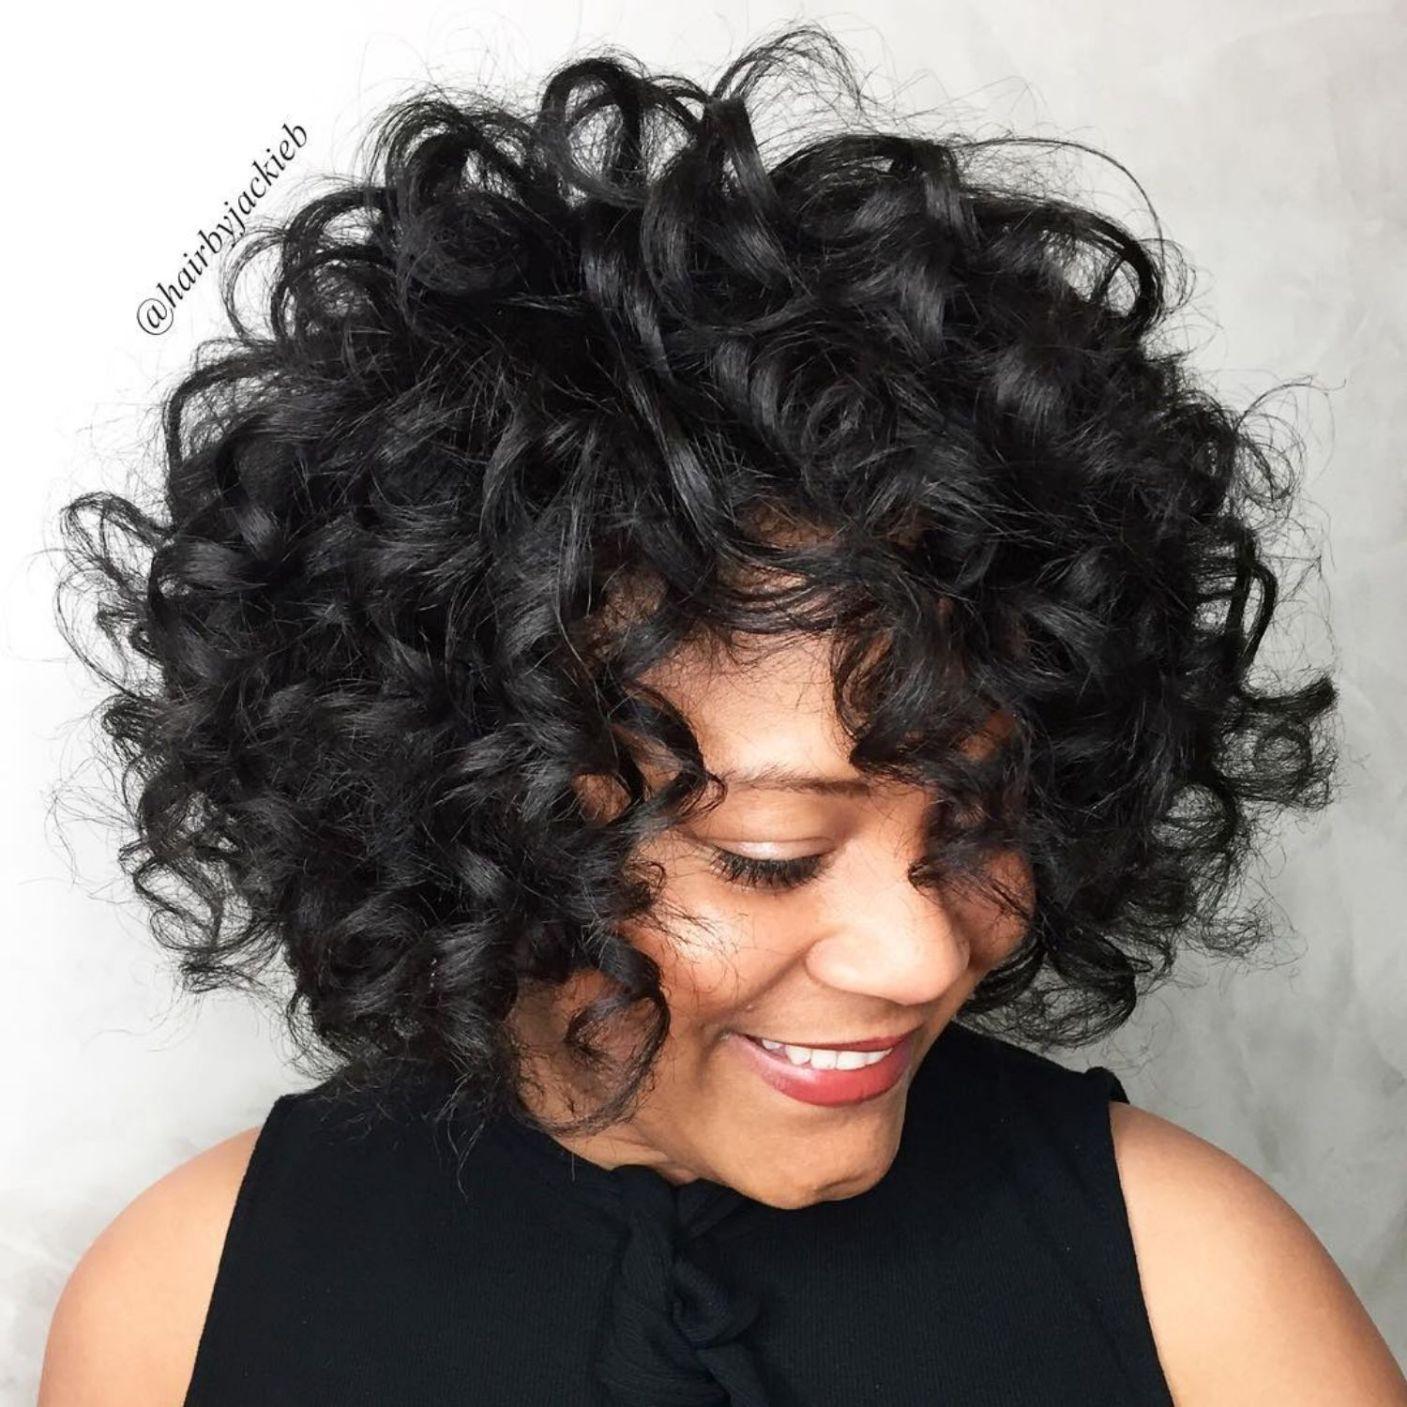 60 Most Delightful Short Wavy Hairstyles In 2020 Short Wavy Hair Curly Hair Photos Hair Styles